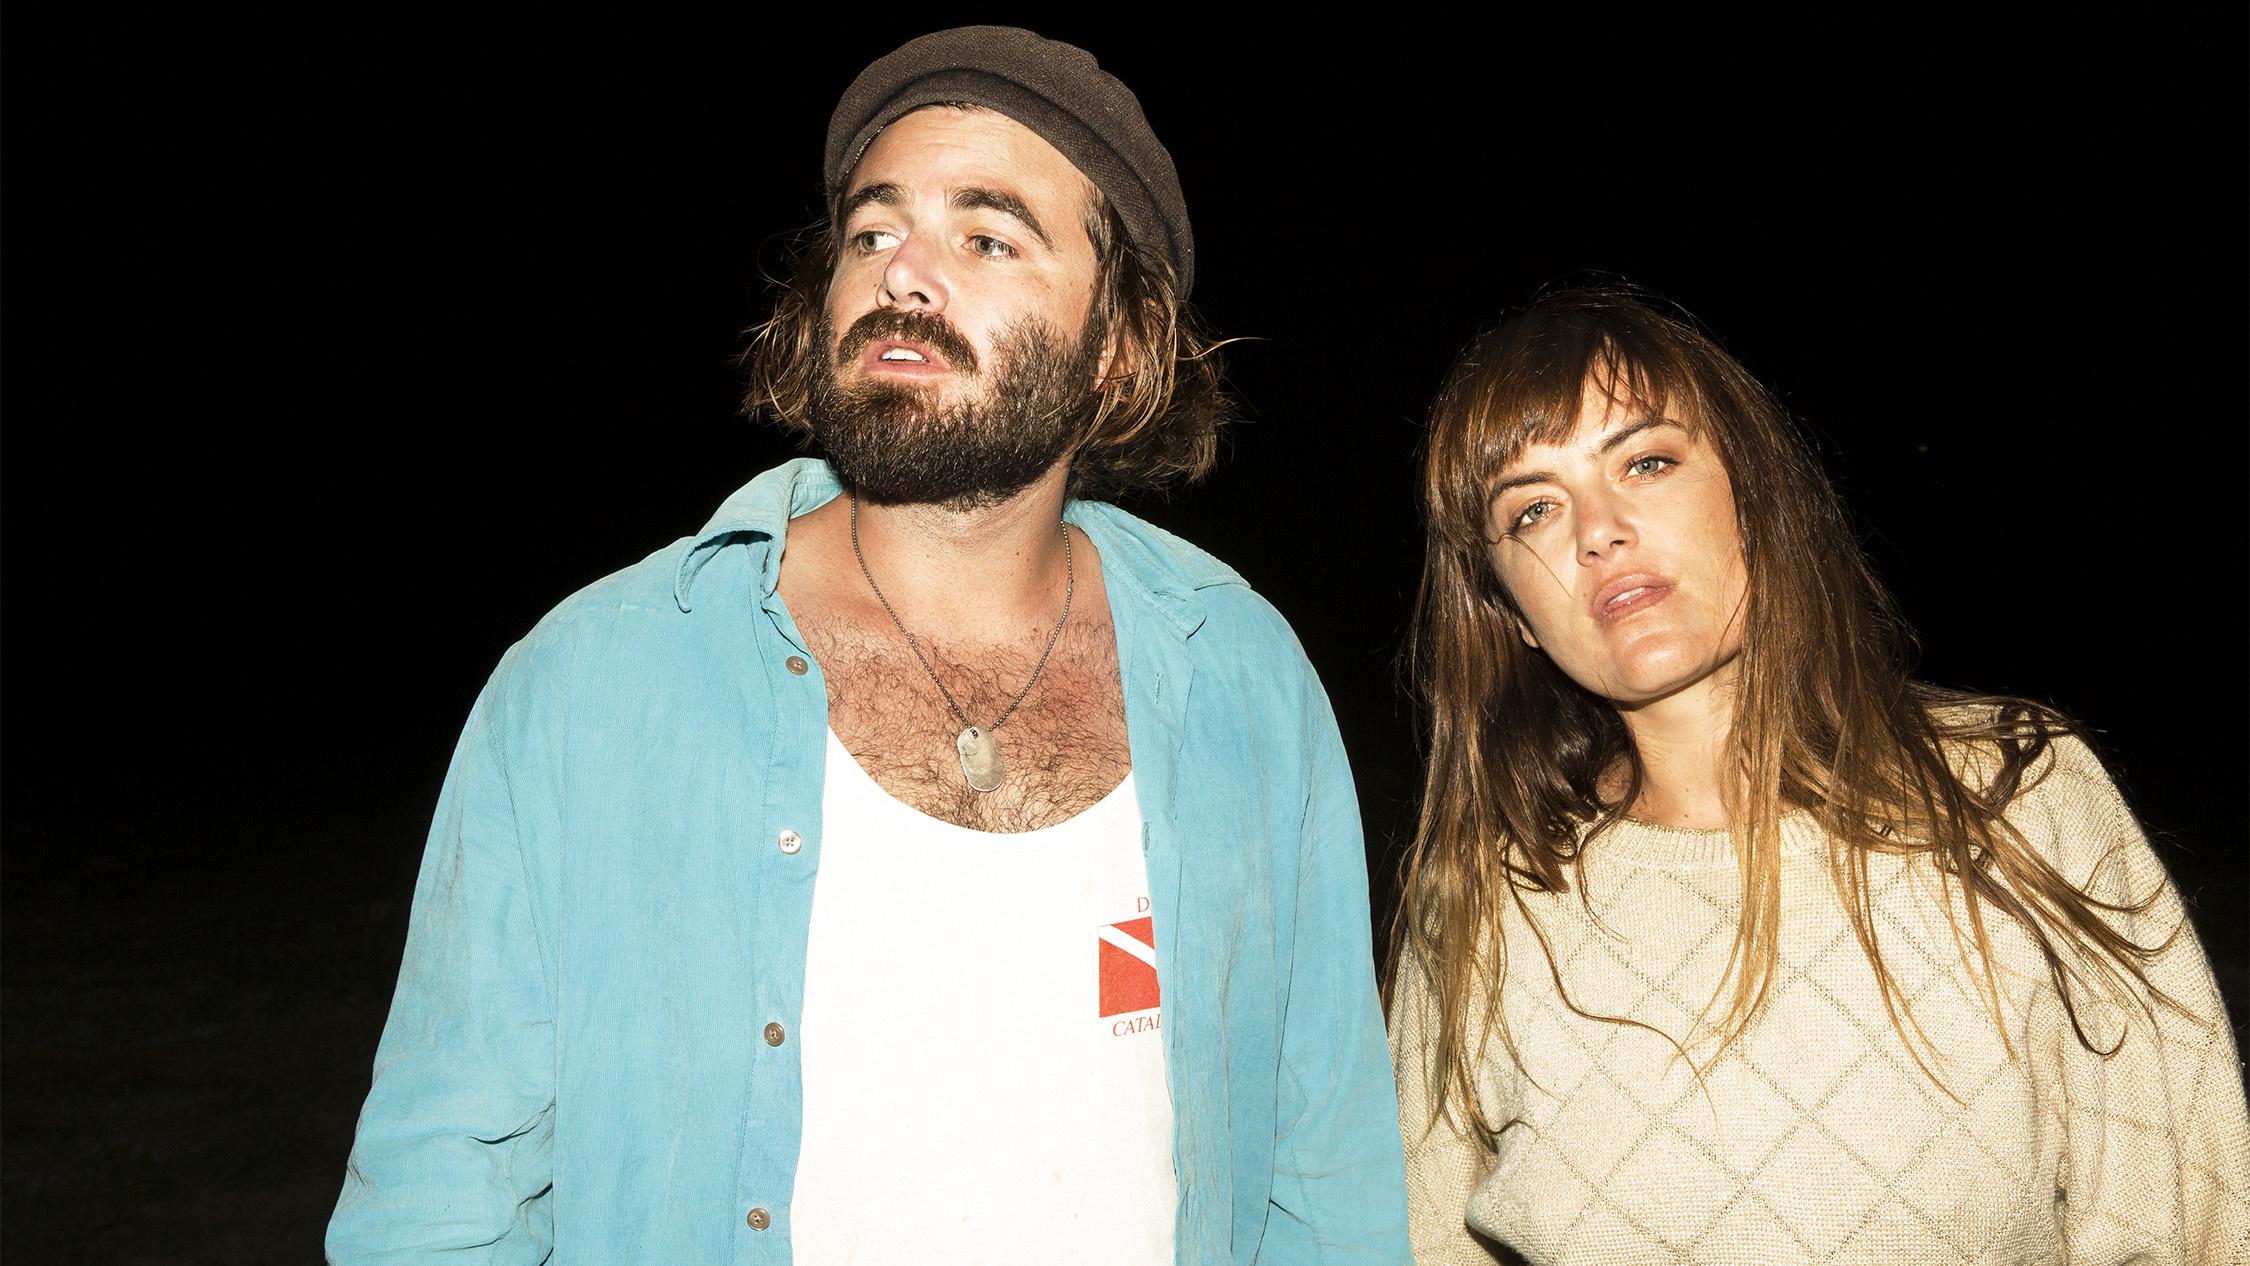 Press shot of Angus and Julia Stone